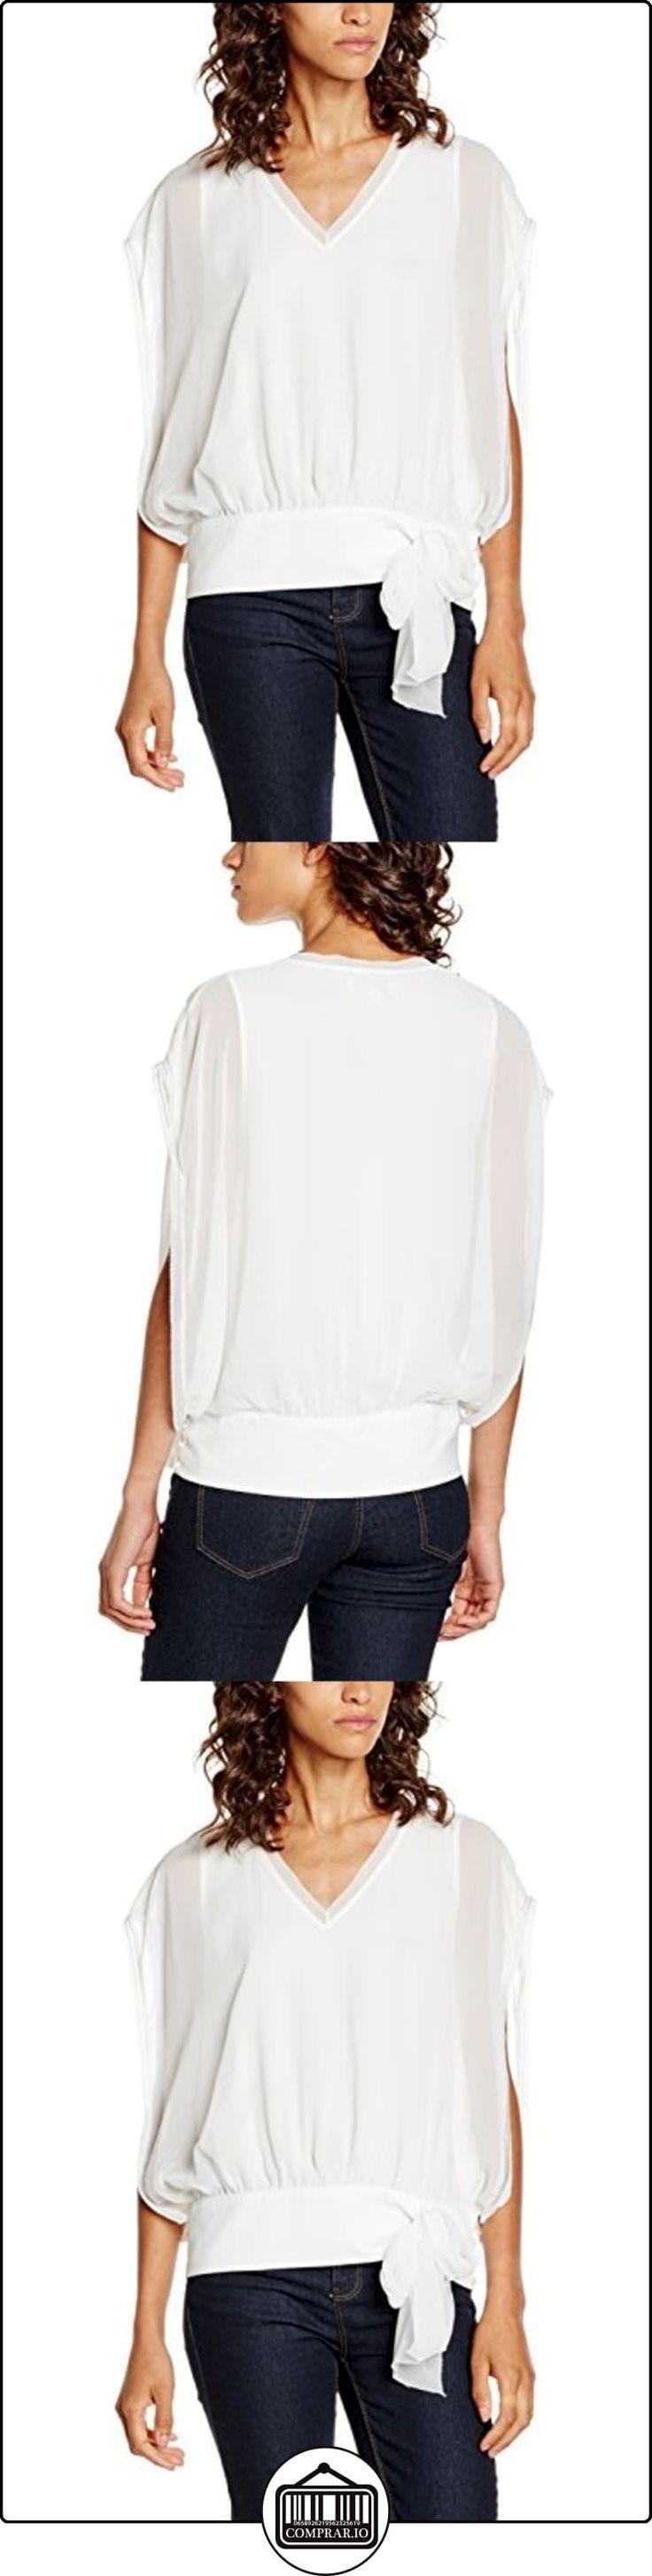 Cortefiel 2.Gym.M.Blusa Lazo, Blusa para Mujer, Beige, XS  ✿ Blusas y camisas ✿